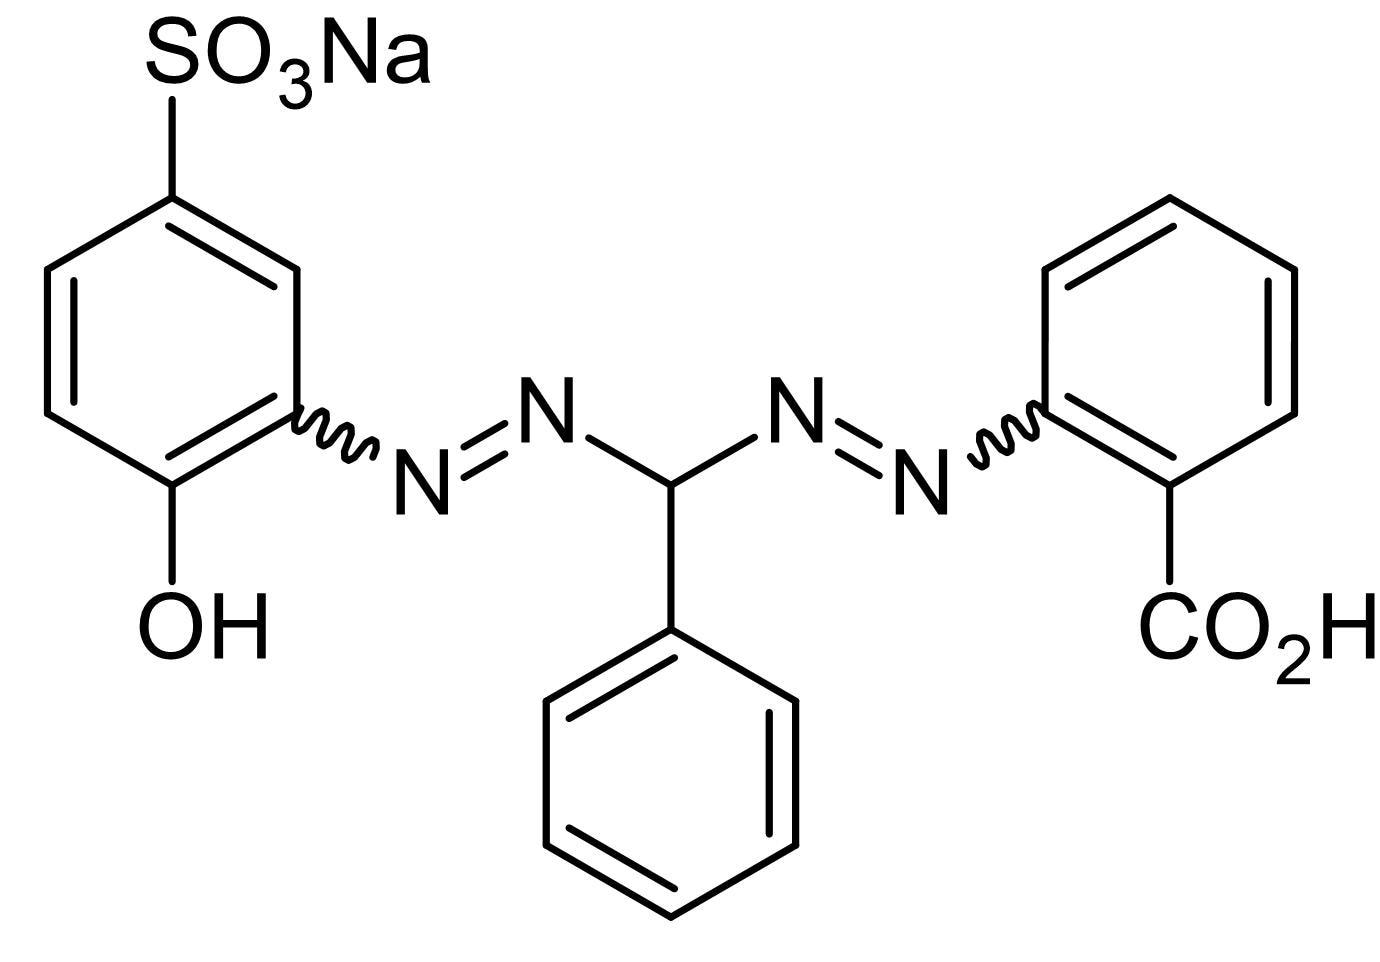 Chemical Structure - Zincon, colorimetric indicator (ab146330)